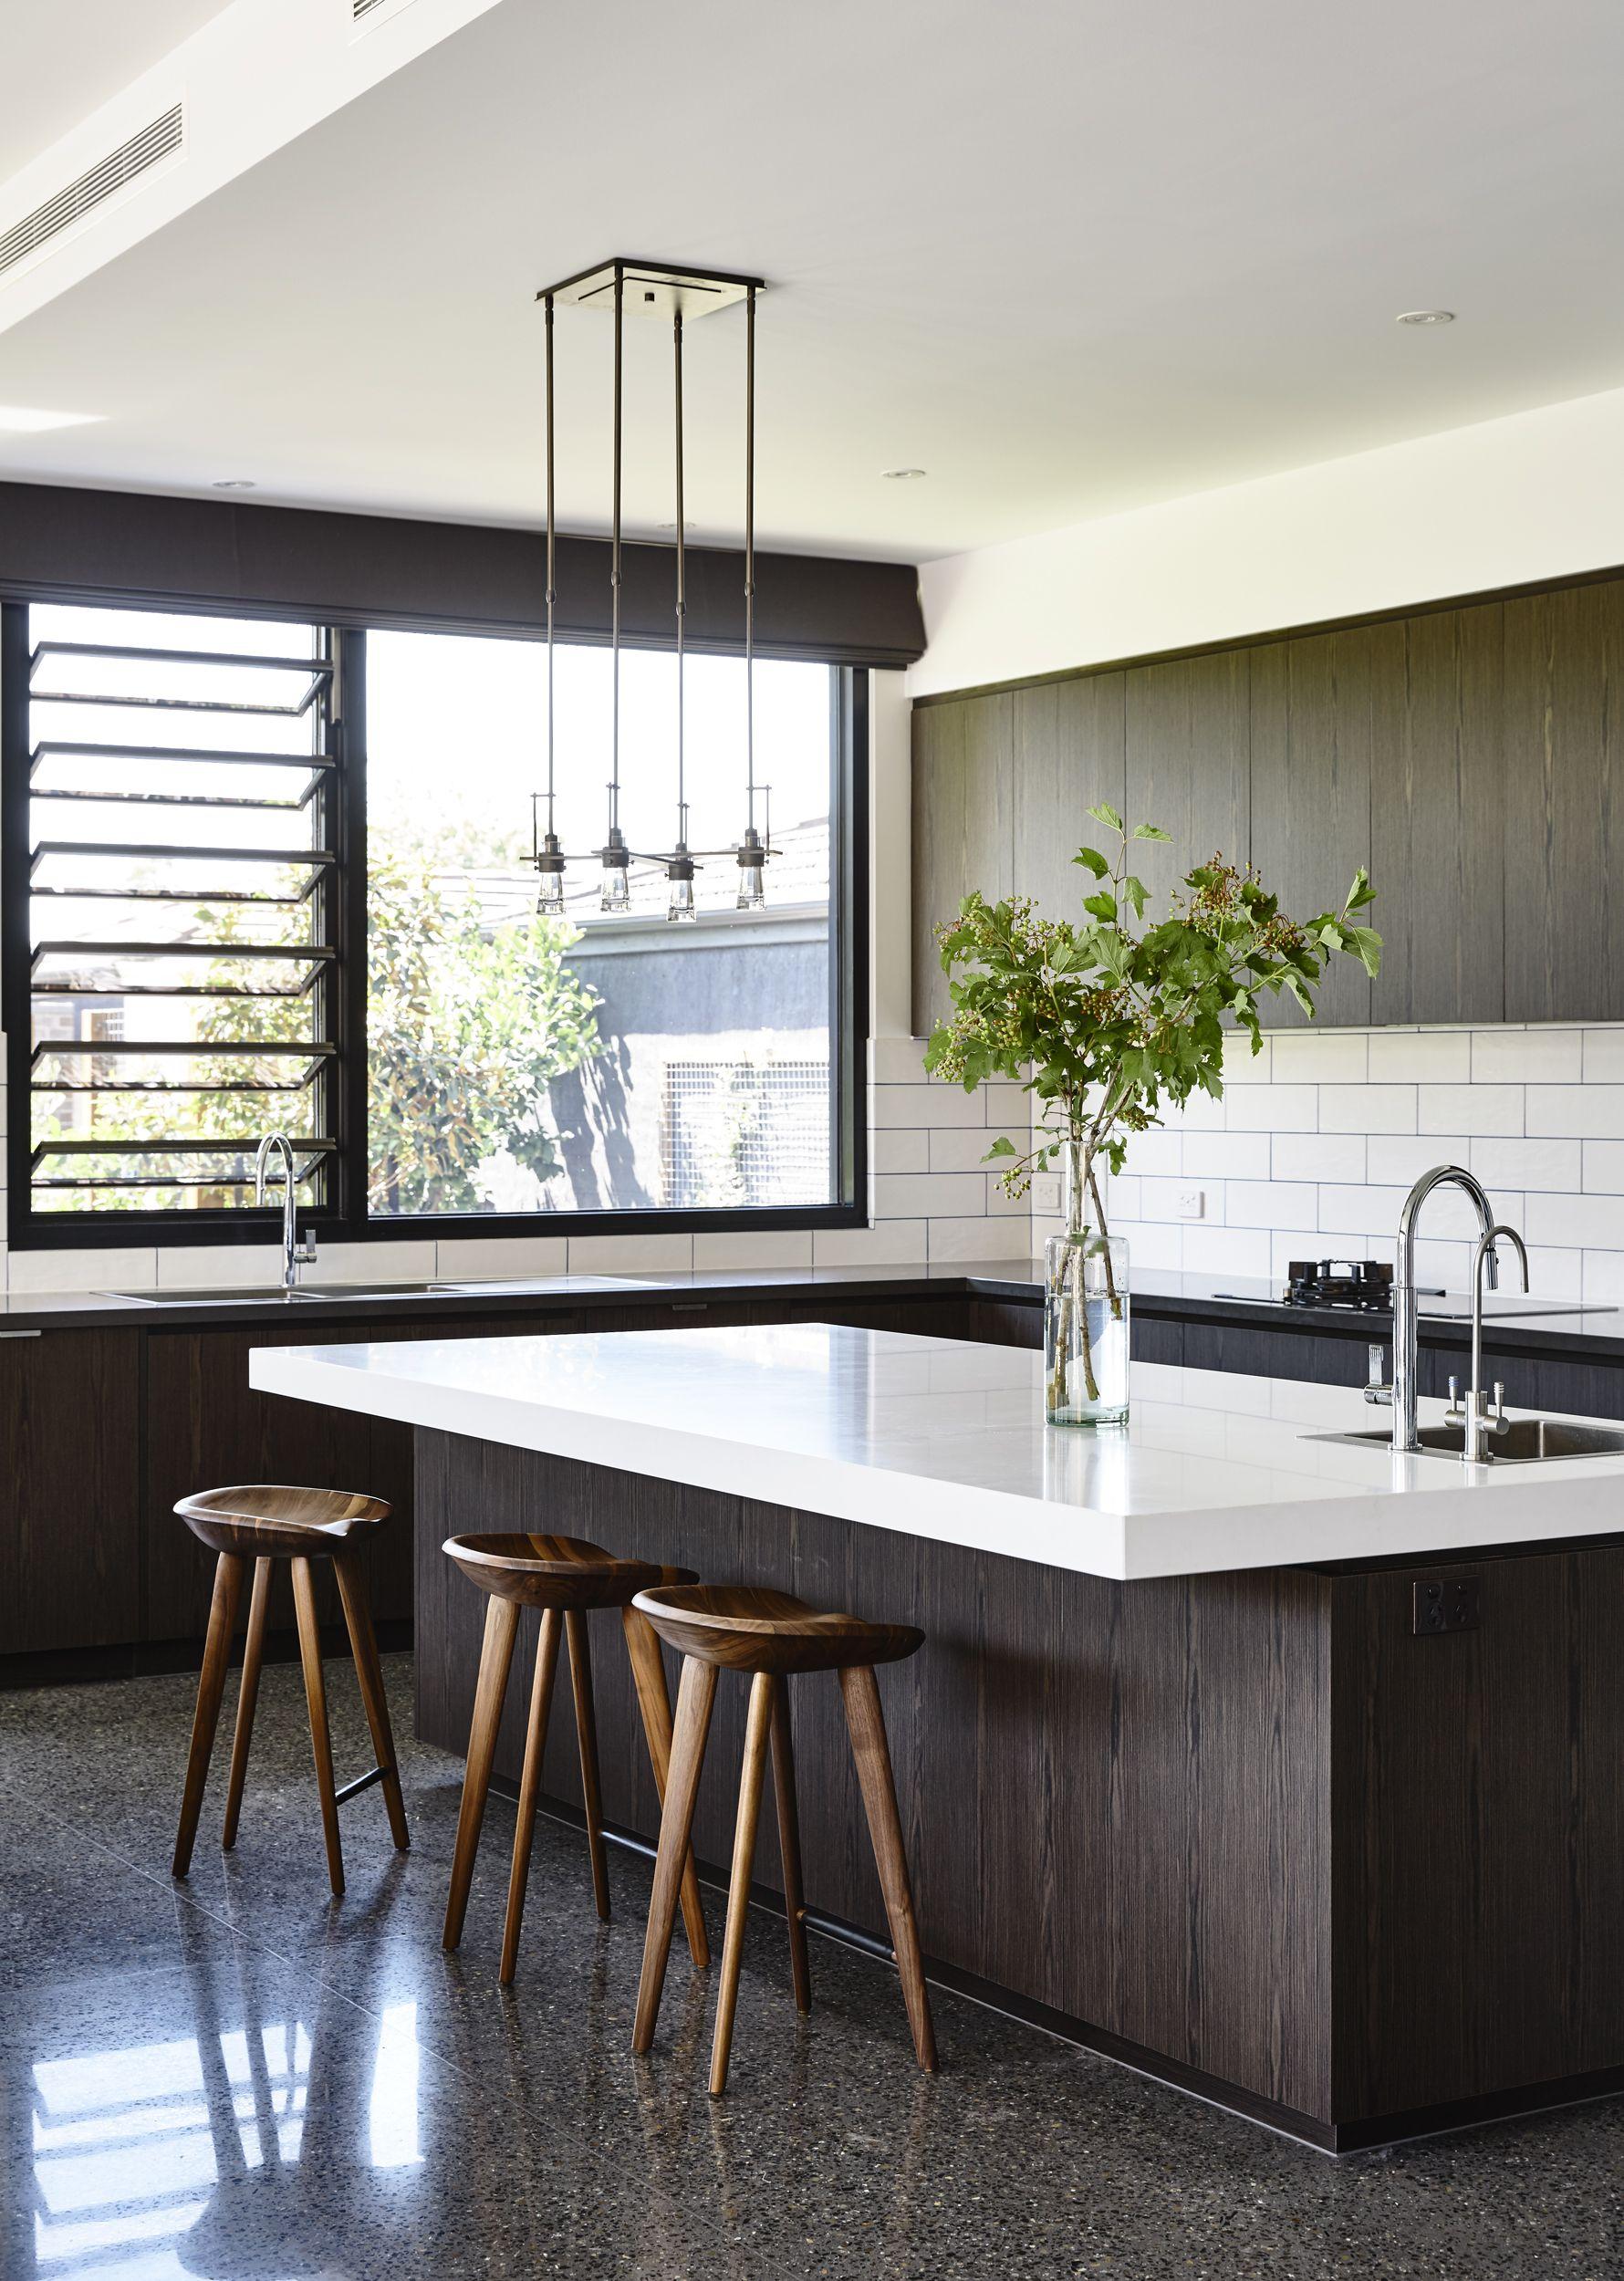 Interior Design Open Kitchen: Residential Interior Design Project By Camilla Molders